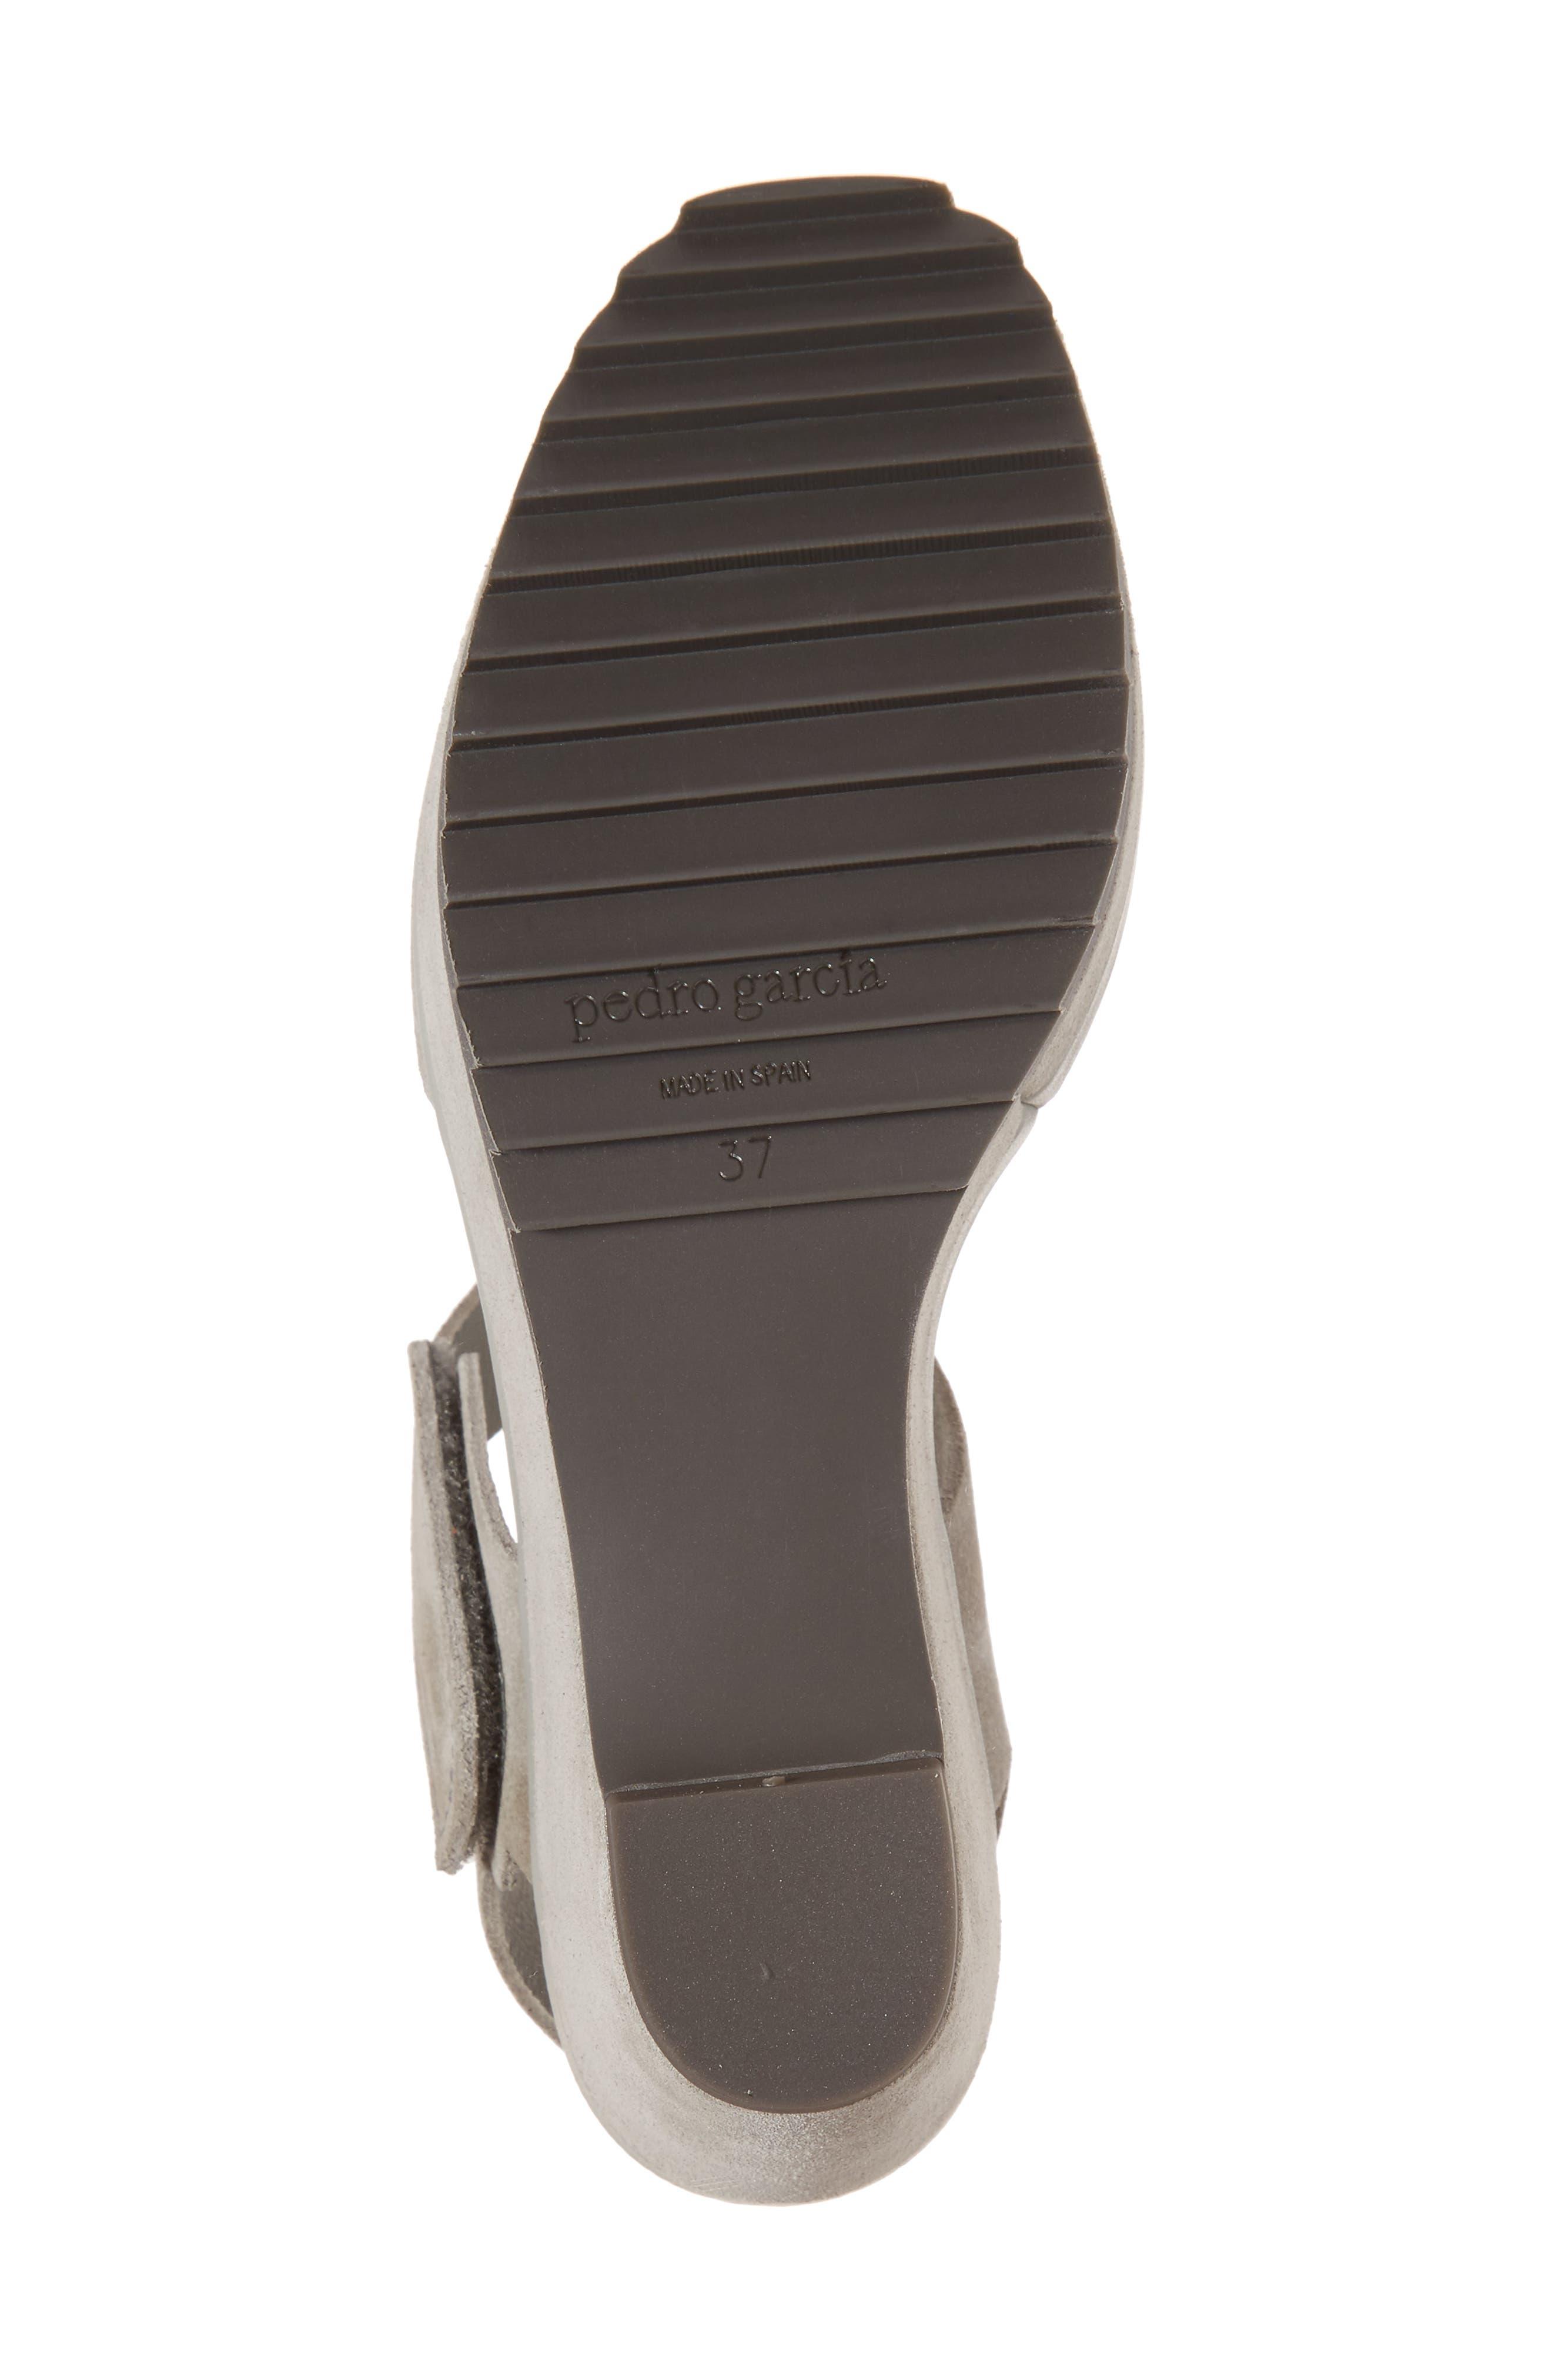 Fah Platform Wedge Sandal,                             Alternate thumbnail 6, color,                             Pumice Castoro